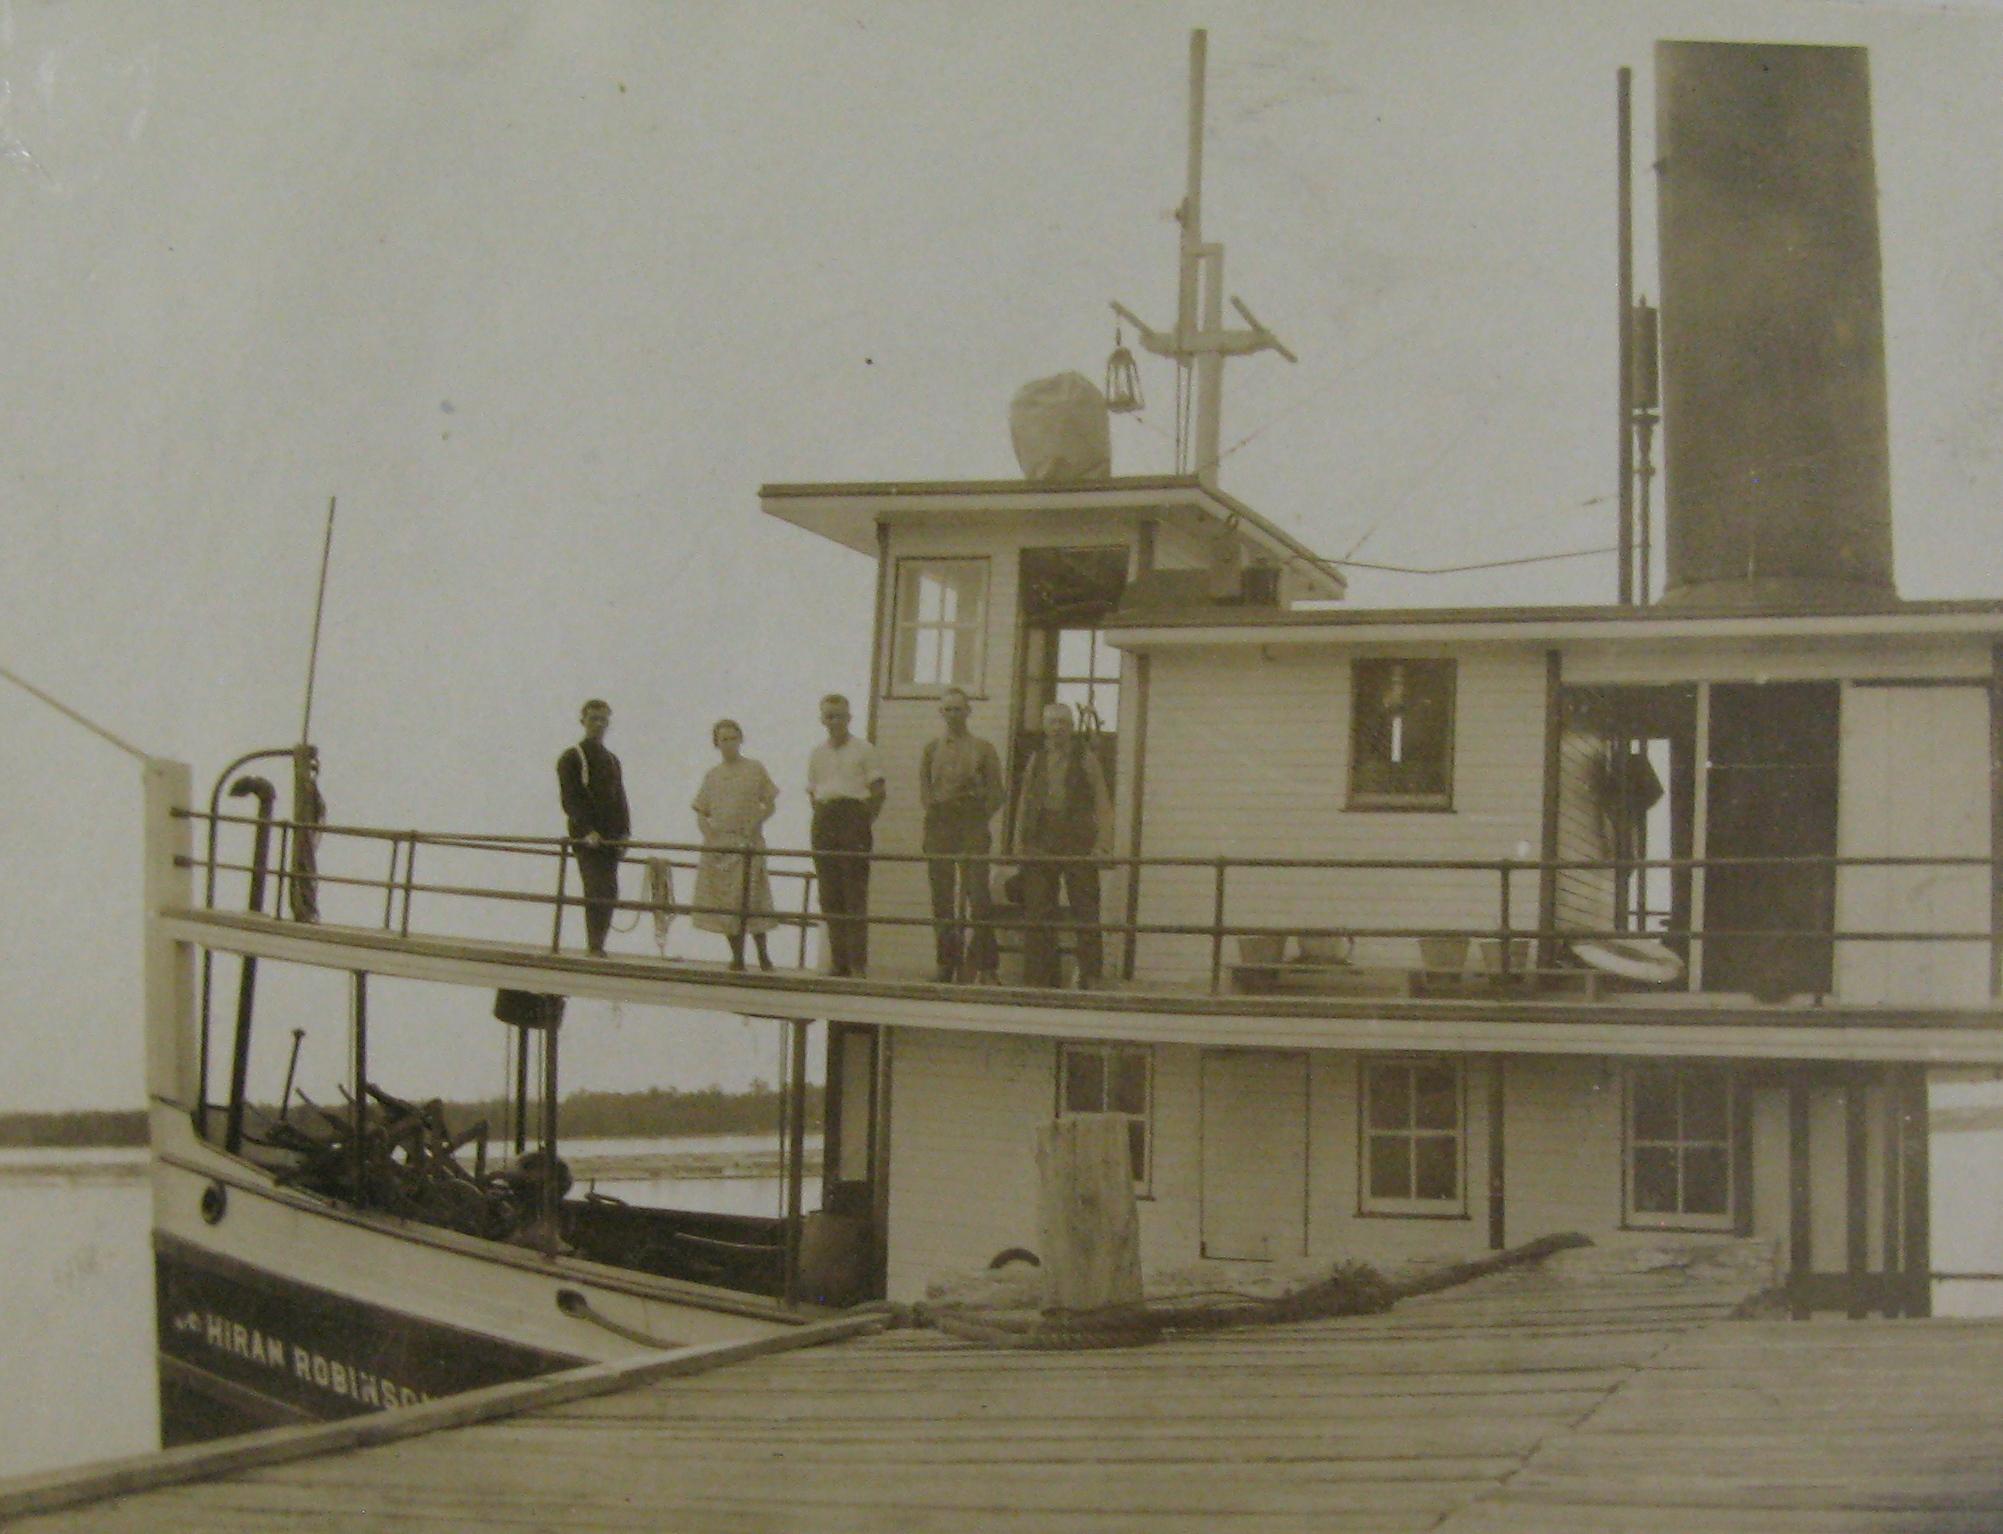 Crew of the Steamship Hiram Robinson (1929).